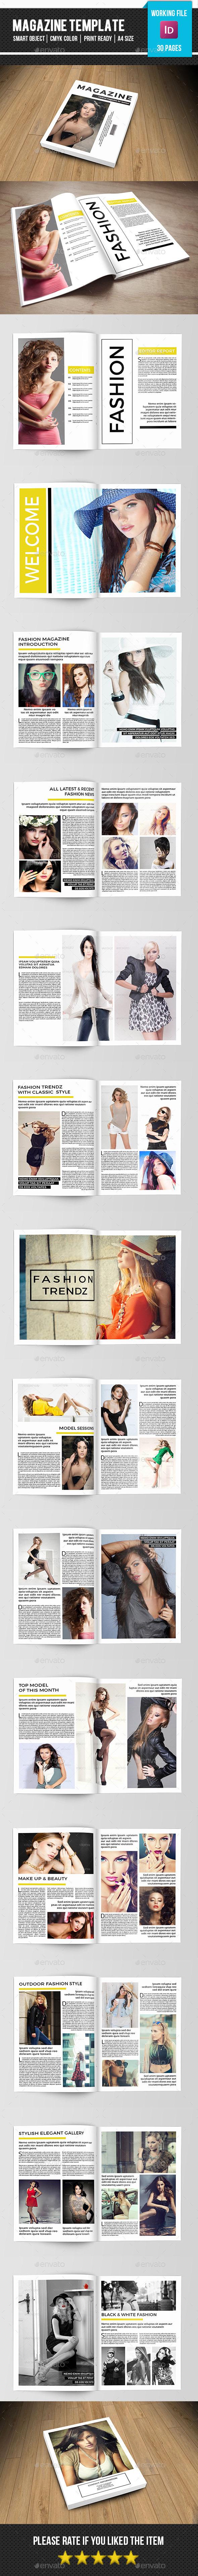 GraphicRiver Minimal Fashion Magazine-V10 11337363